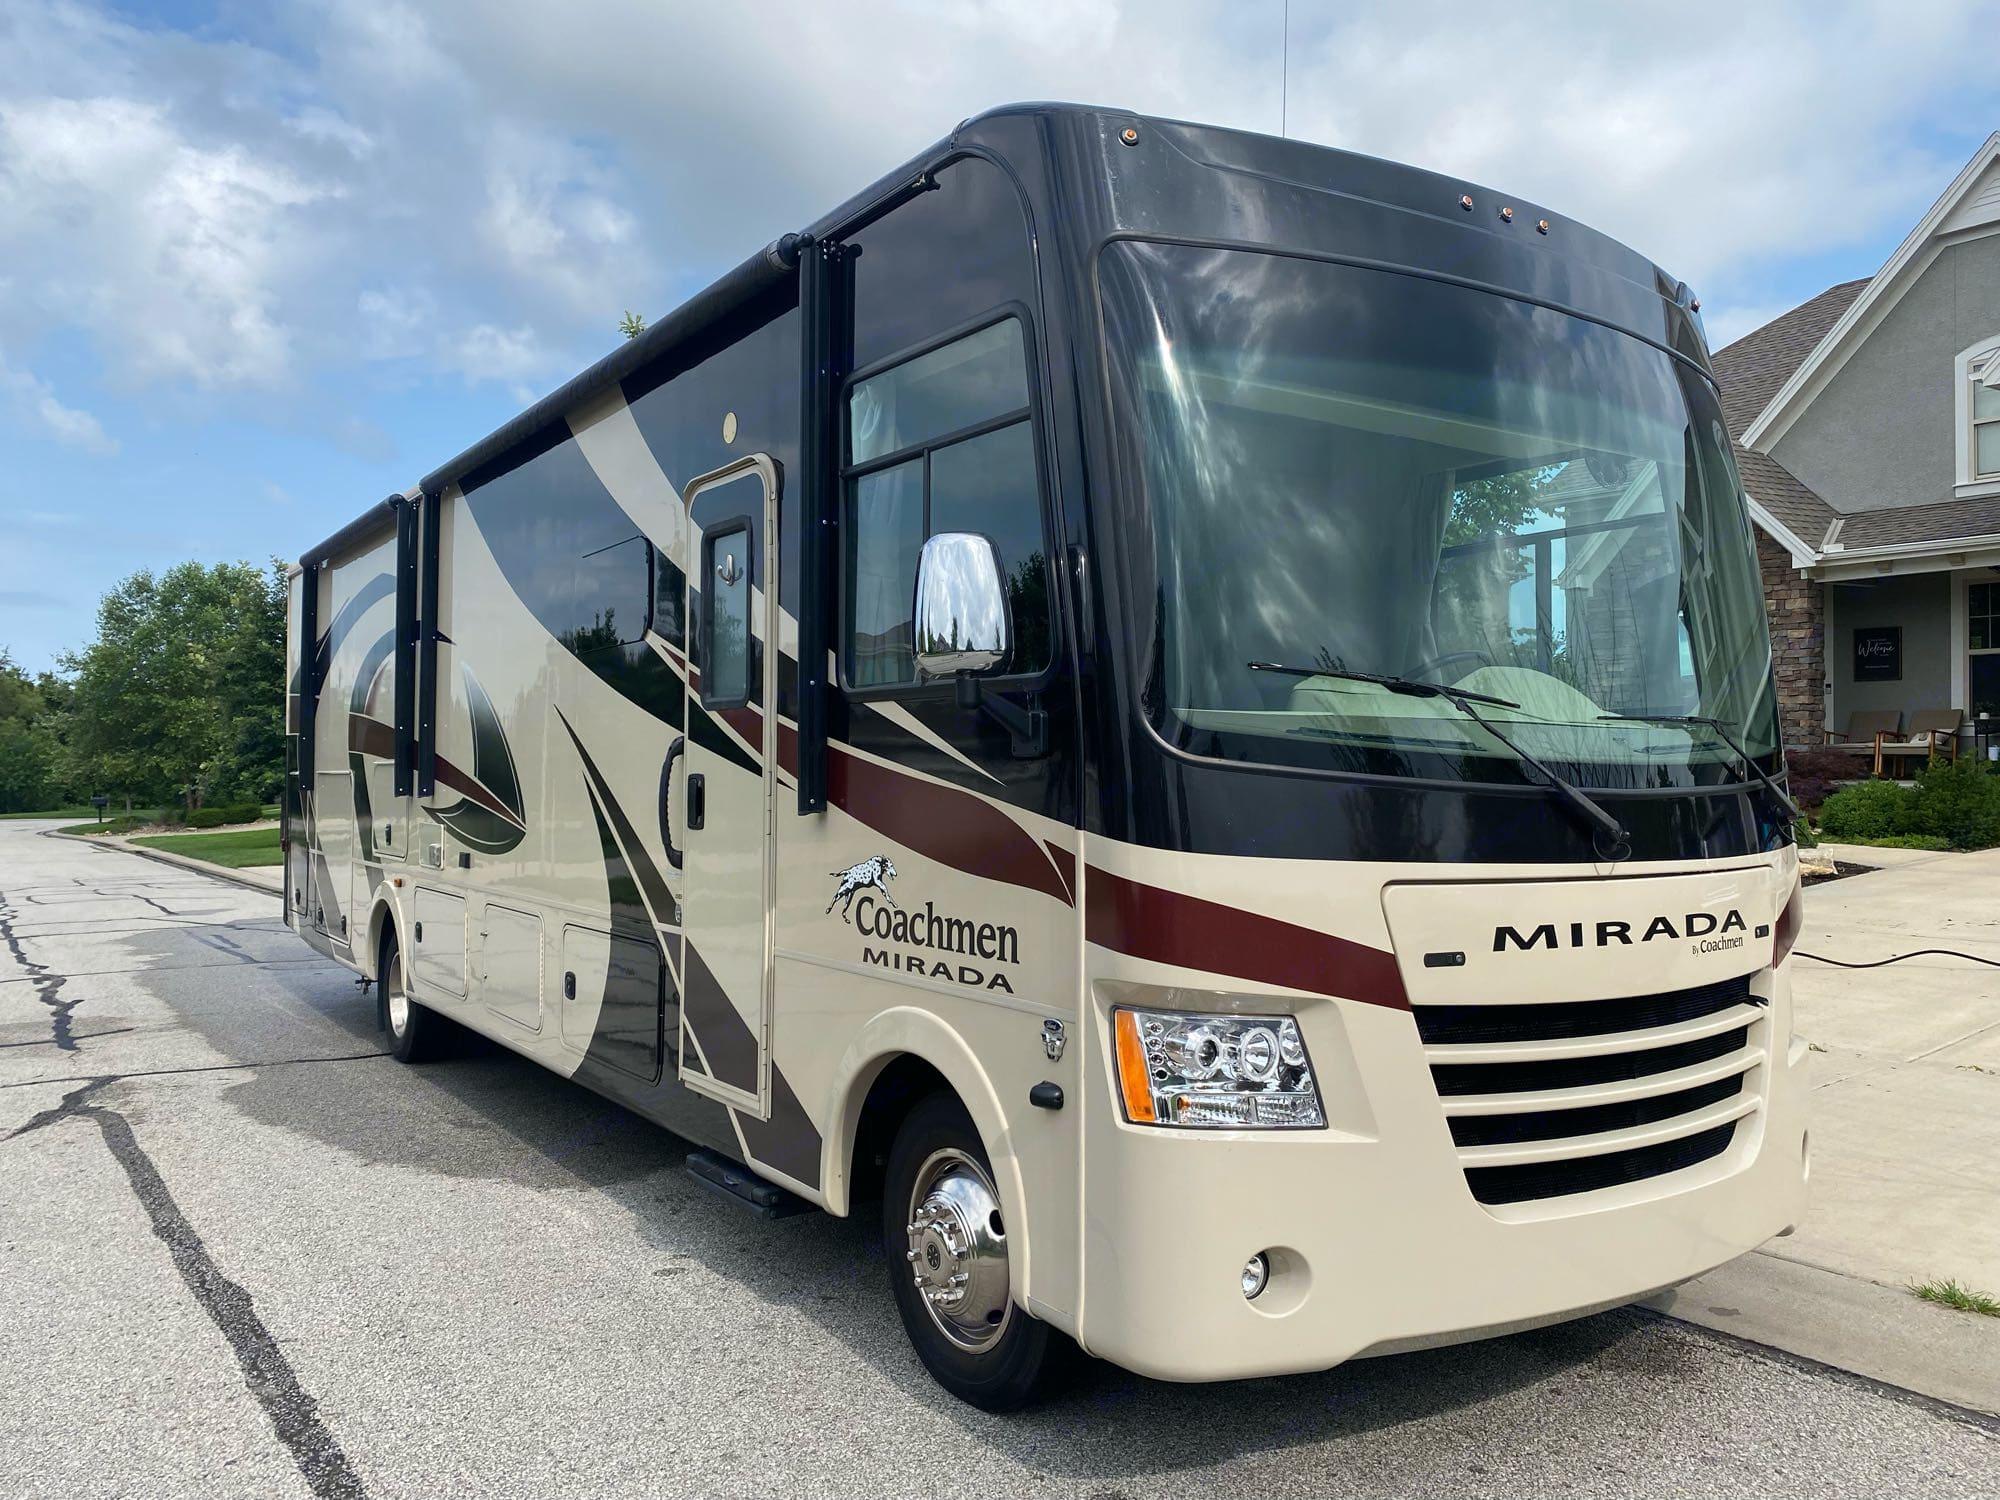 Coachmen Mirada A-Class 2019